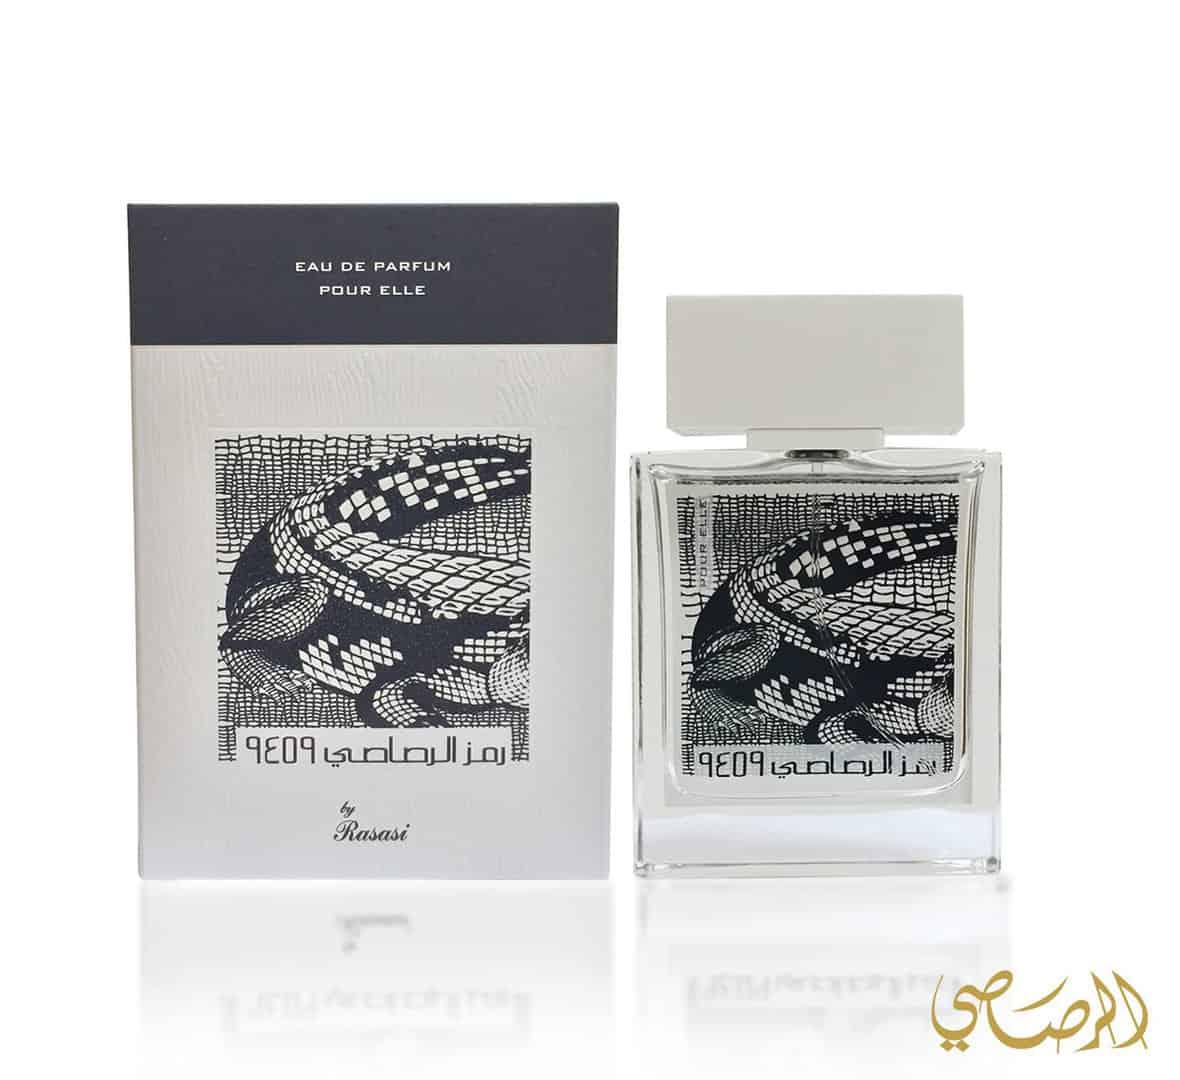 Rasasi Rumz al Rasasi 9459 Croco pour Elle - ادو پرفیوم زنانه ی الرصاصی مدل Rumz AL Rasasi 9459 Pour Elle حجم 50میلی لیتر